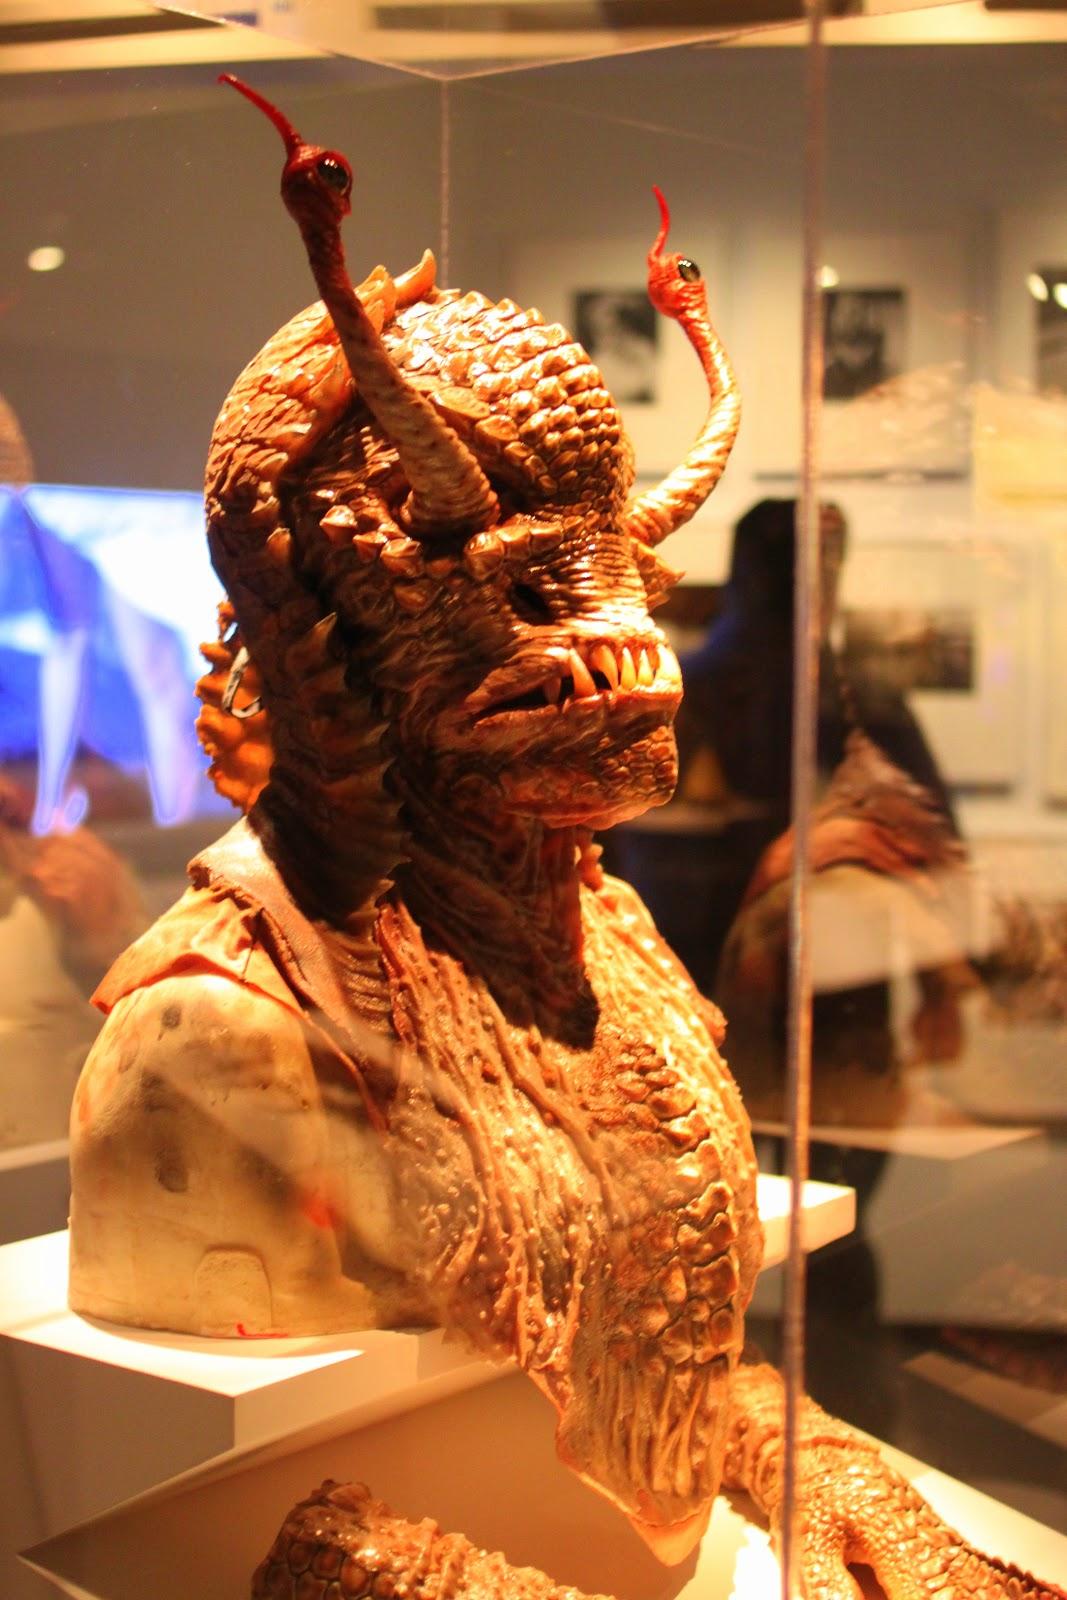 http://2.bp.blogspot.com/-F18koLYCrHk/UI2DTtaQlDI/AAAAAAAAESc/s_I3URqAfqs/s1600/men_in_black_mask.JPG